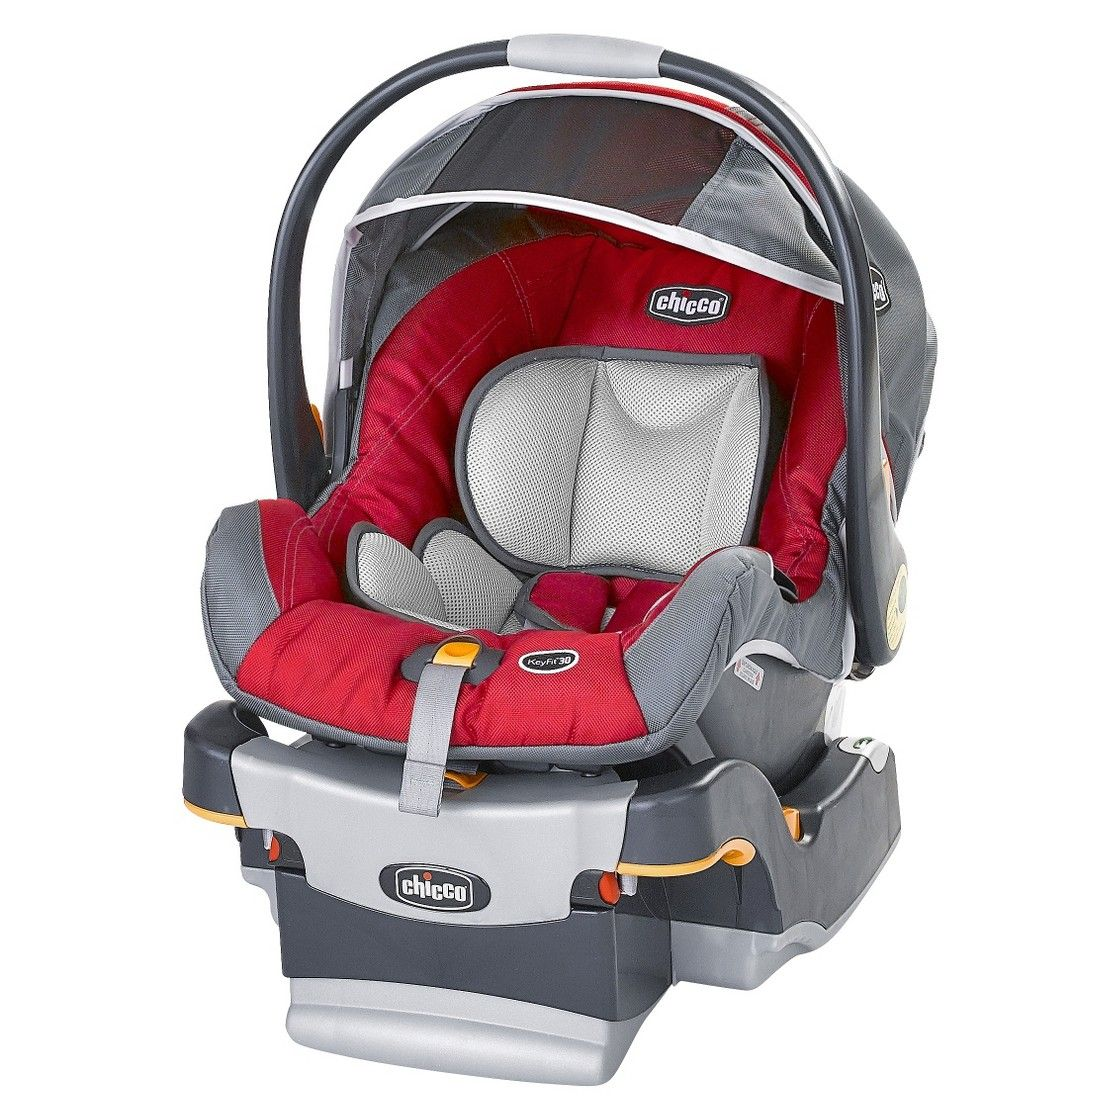 Chicco keyfit 30 infant car seat baby car seats car